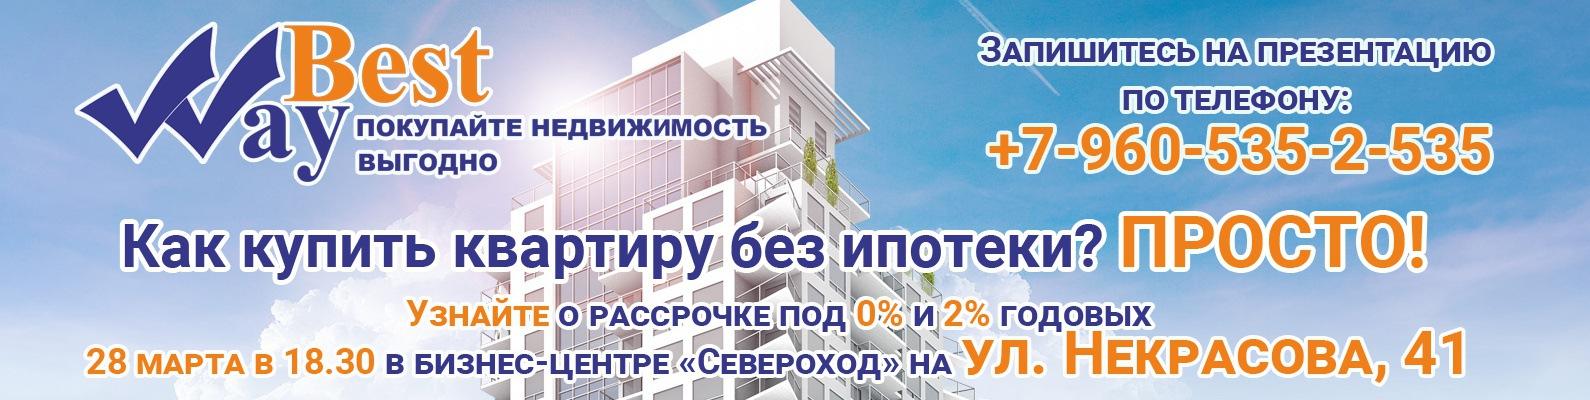 8e3d7d6322eef Как купить квартиру без ипотеки с ЖК Бест Вей! | ВКонтакте